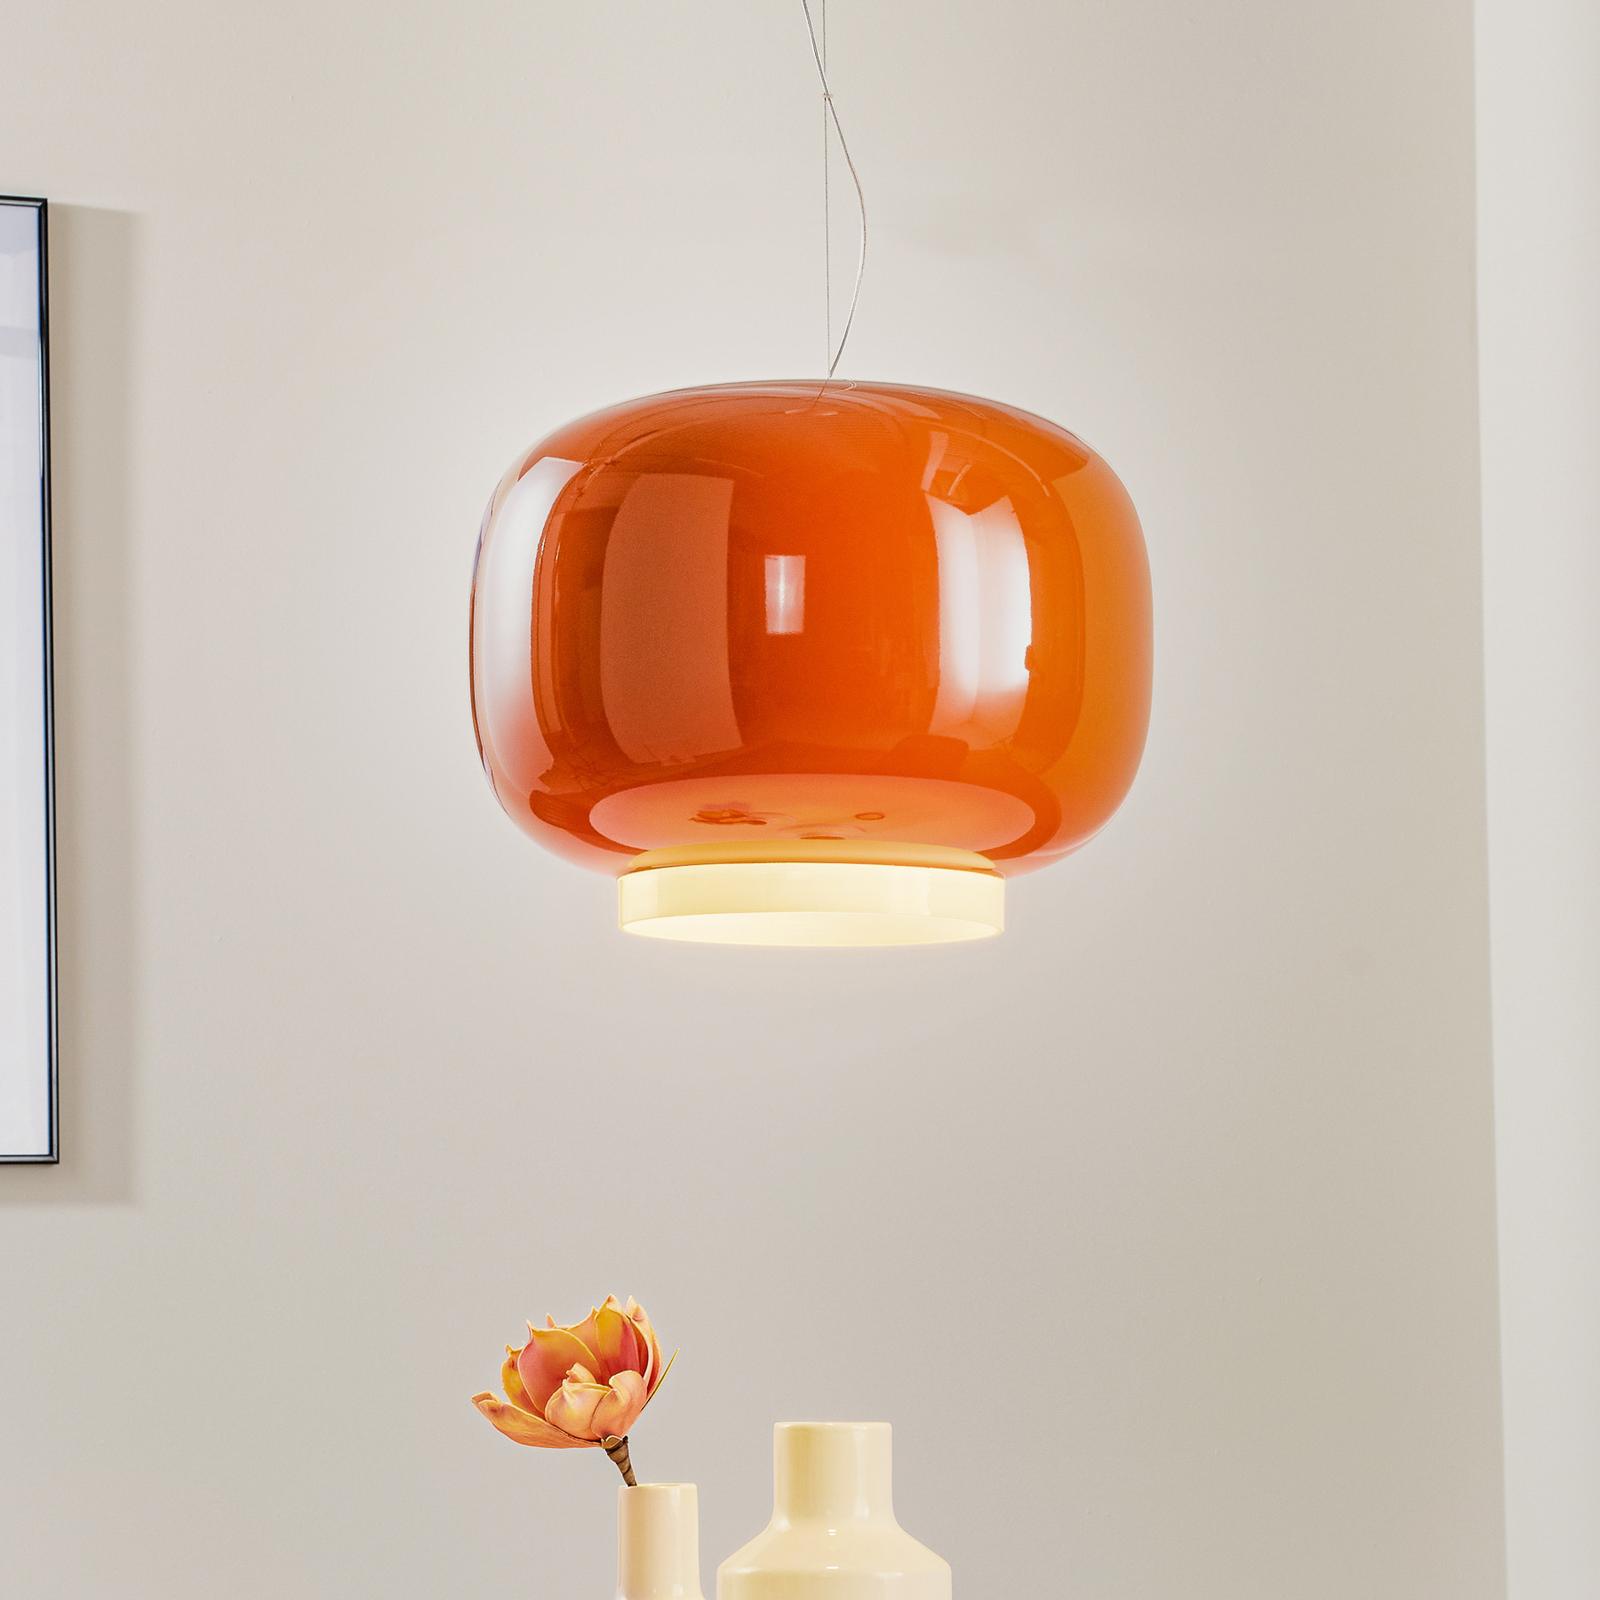 Foscarini Chouchin 1 LED-hængelampe, orange